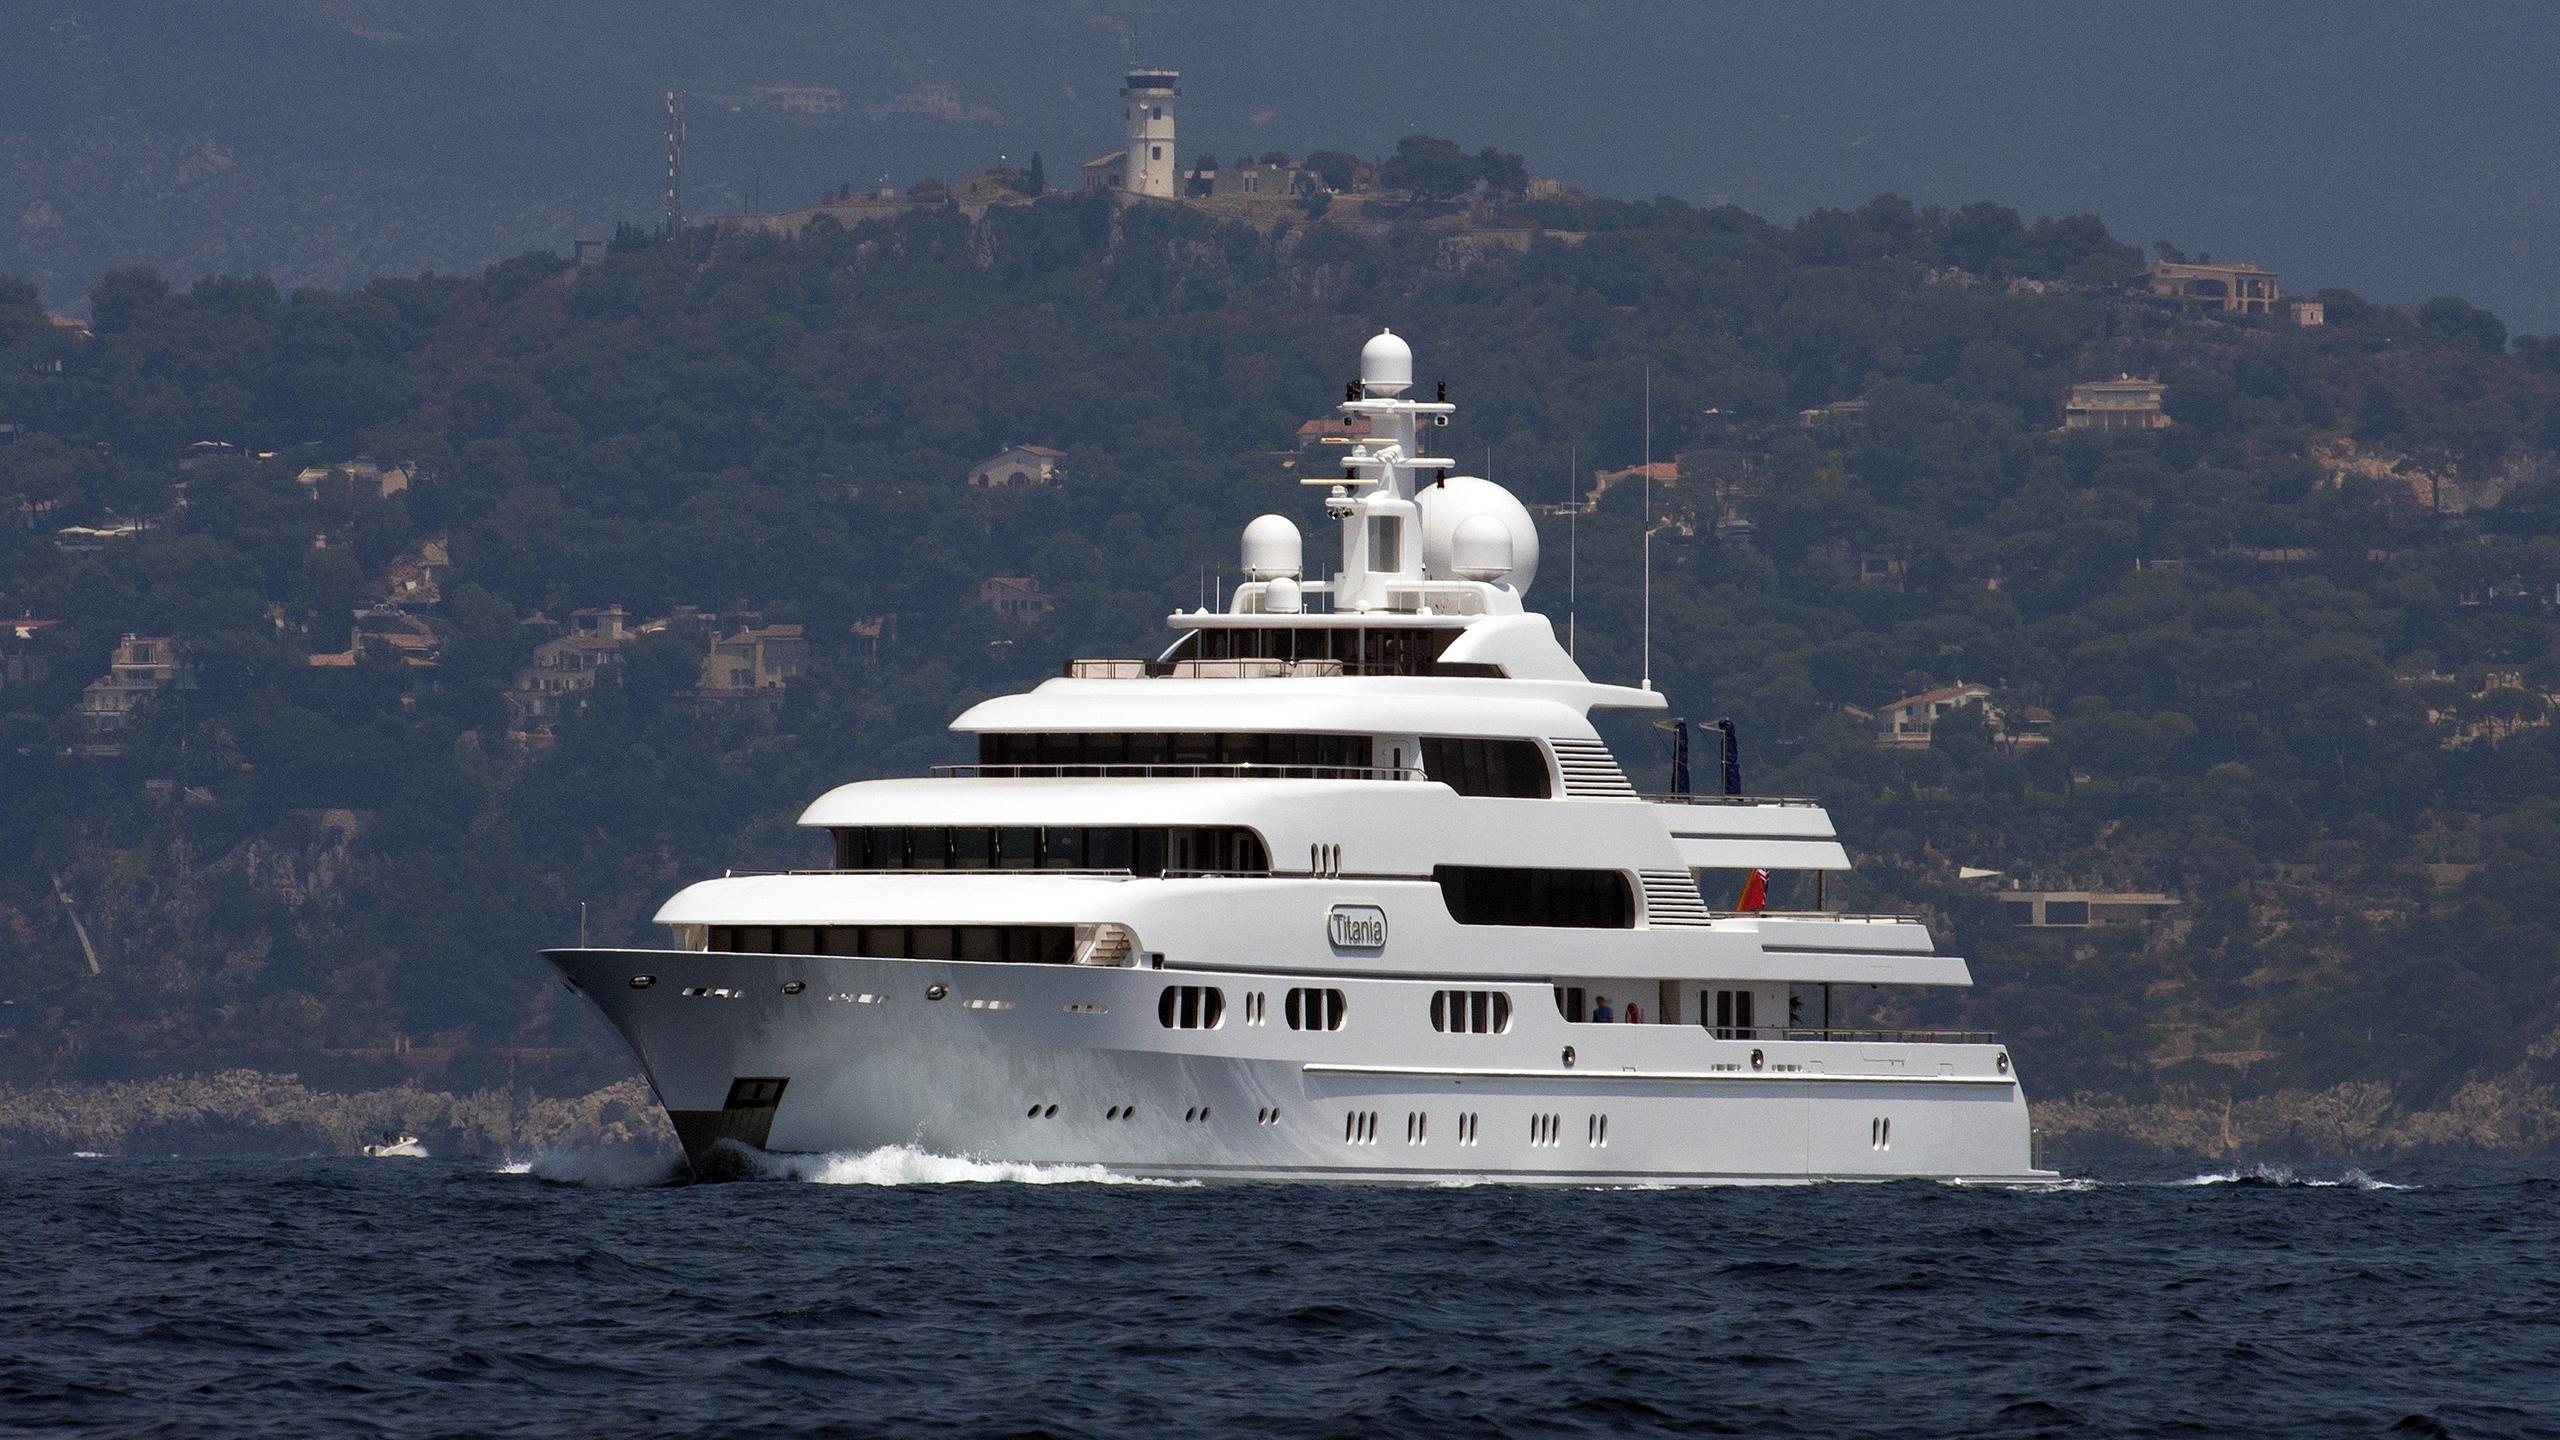 titania-motor-yacht-lurssen-2006-72m-half-profile-bow